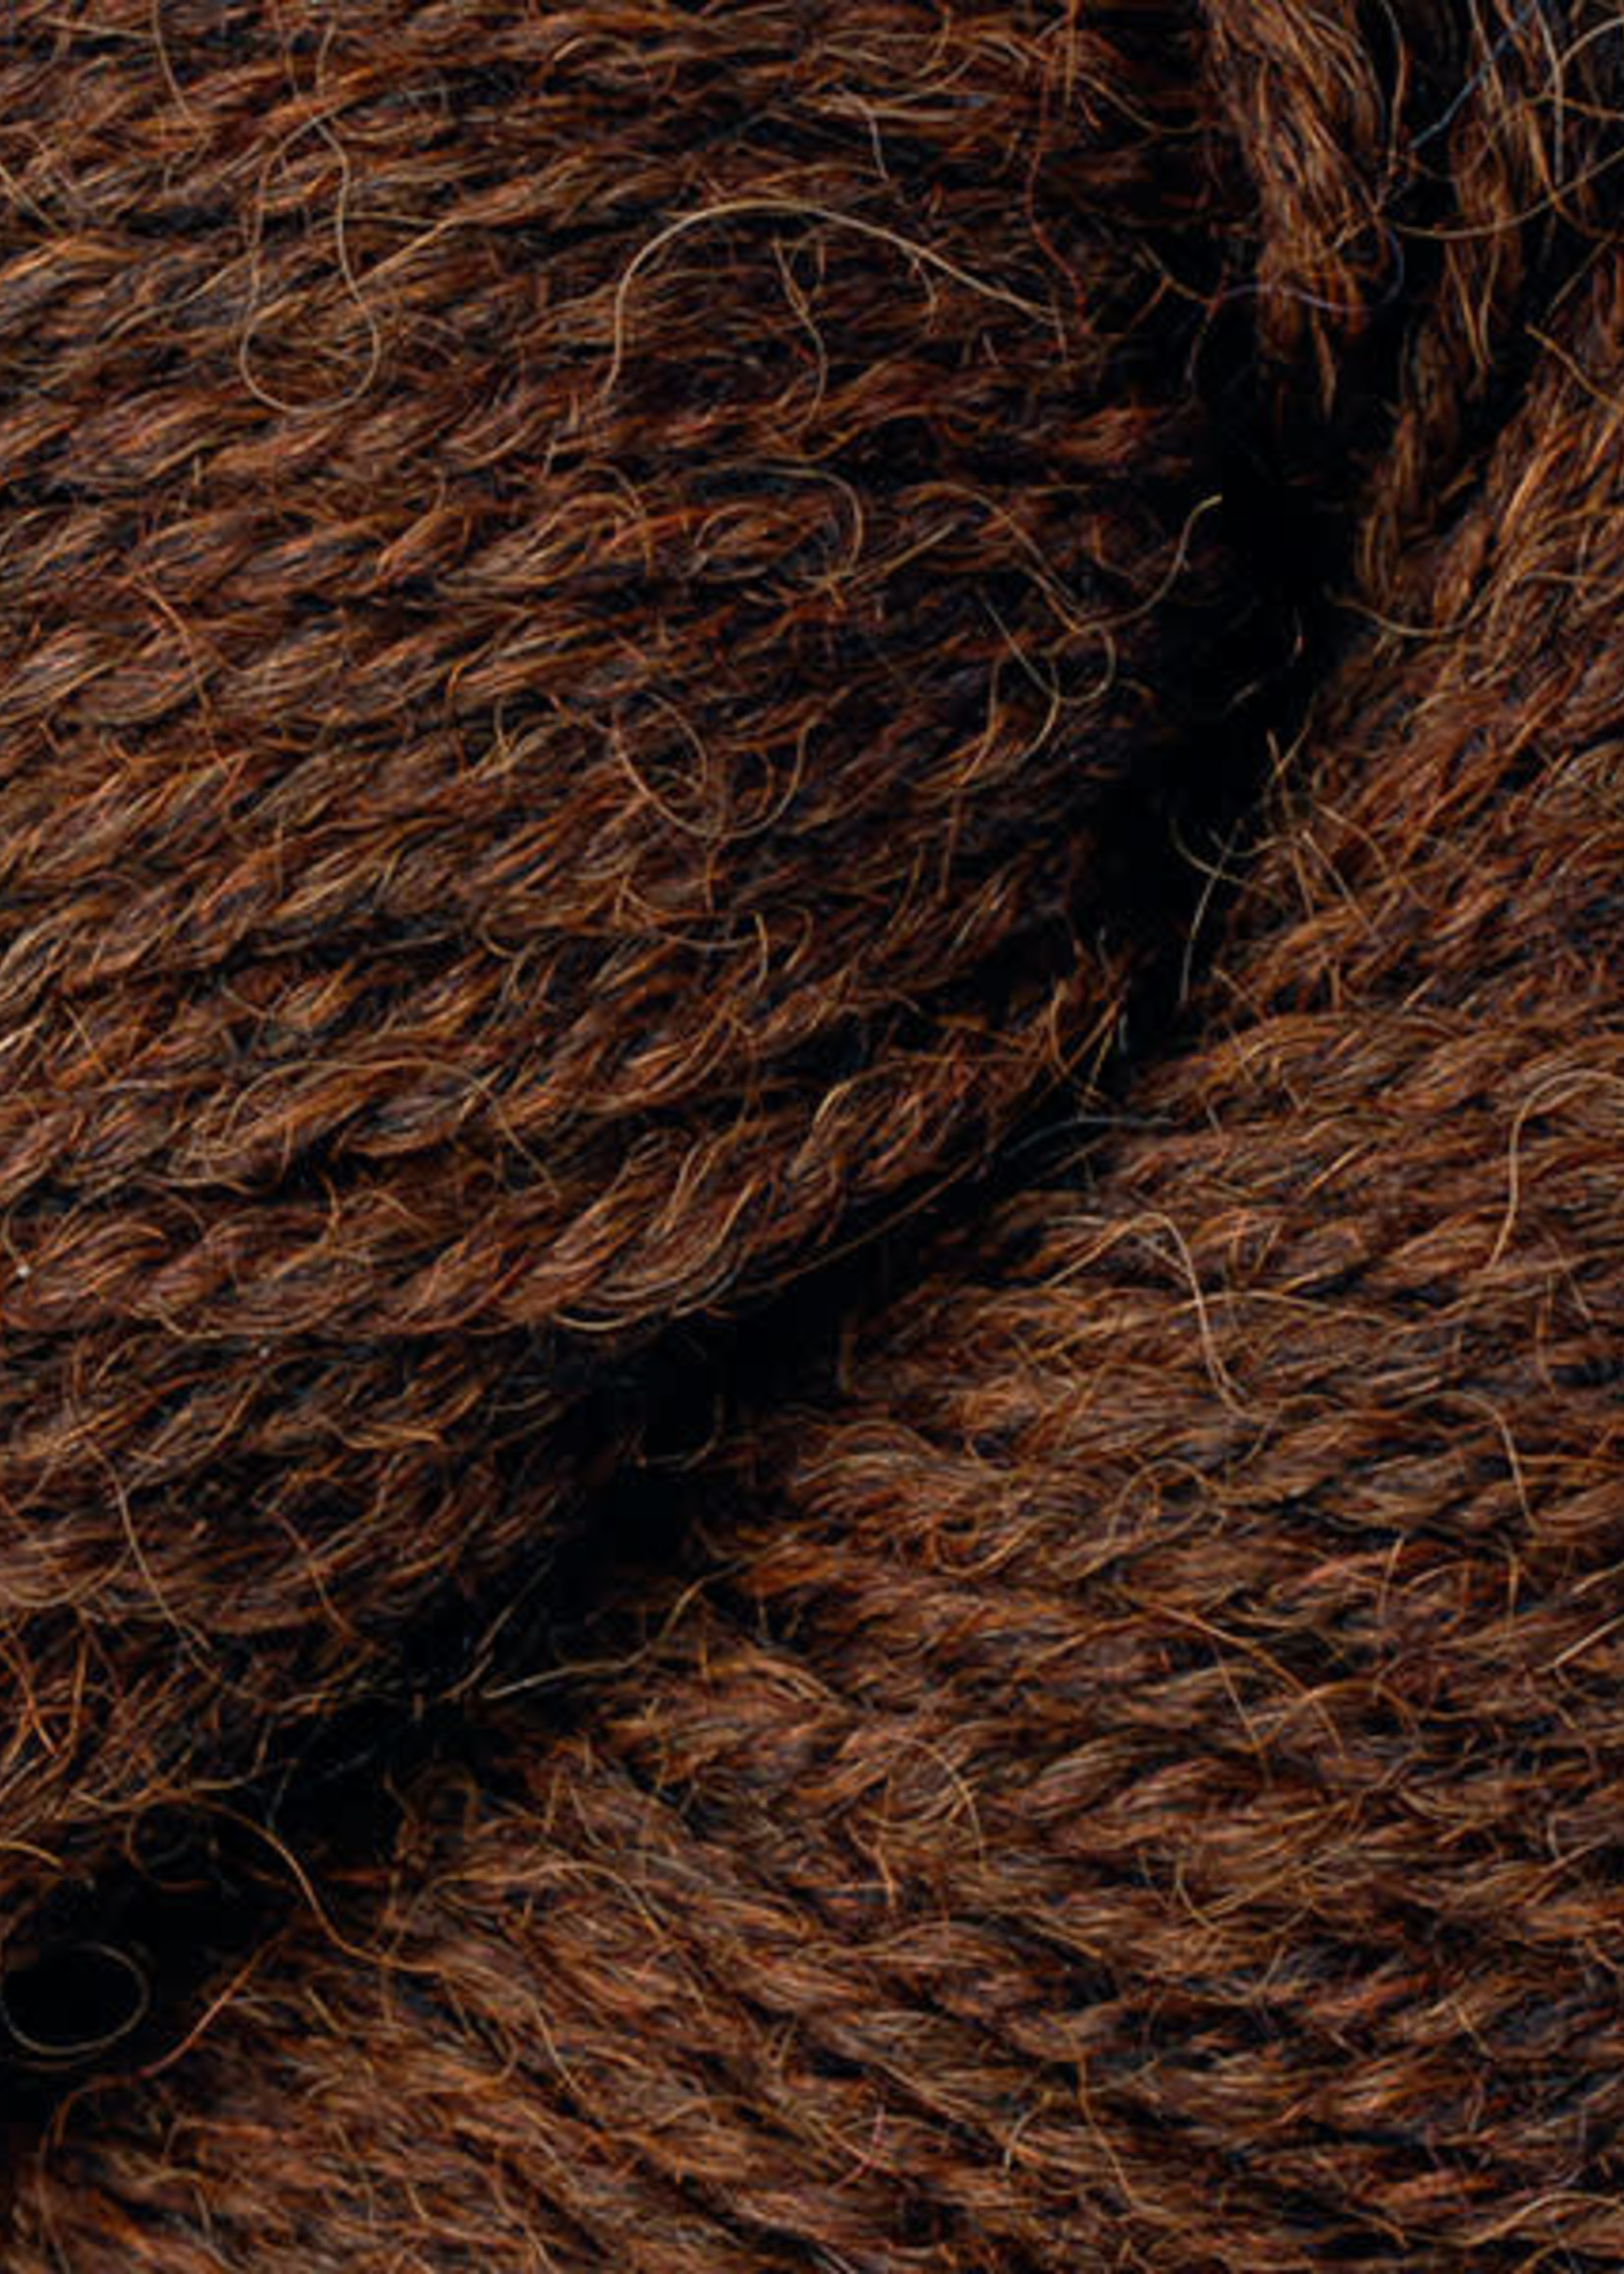 Berroco Berroco Ultra Alpaca Light Yarn #4279 Potting Soil Mix